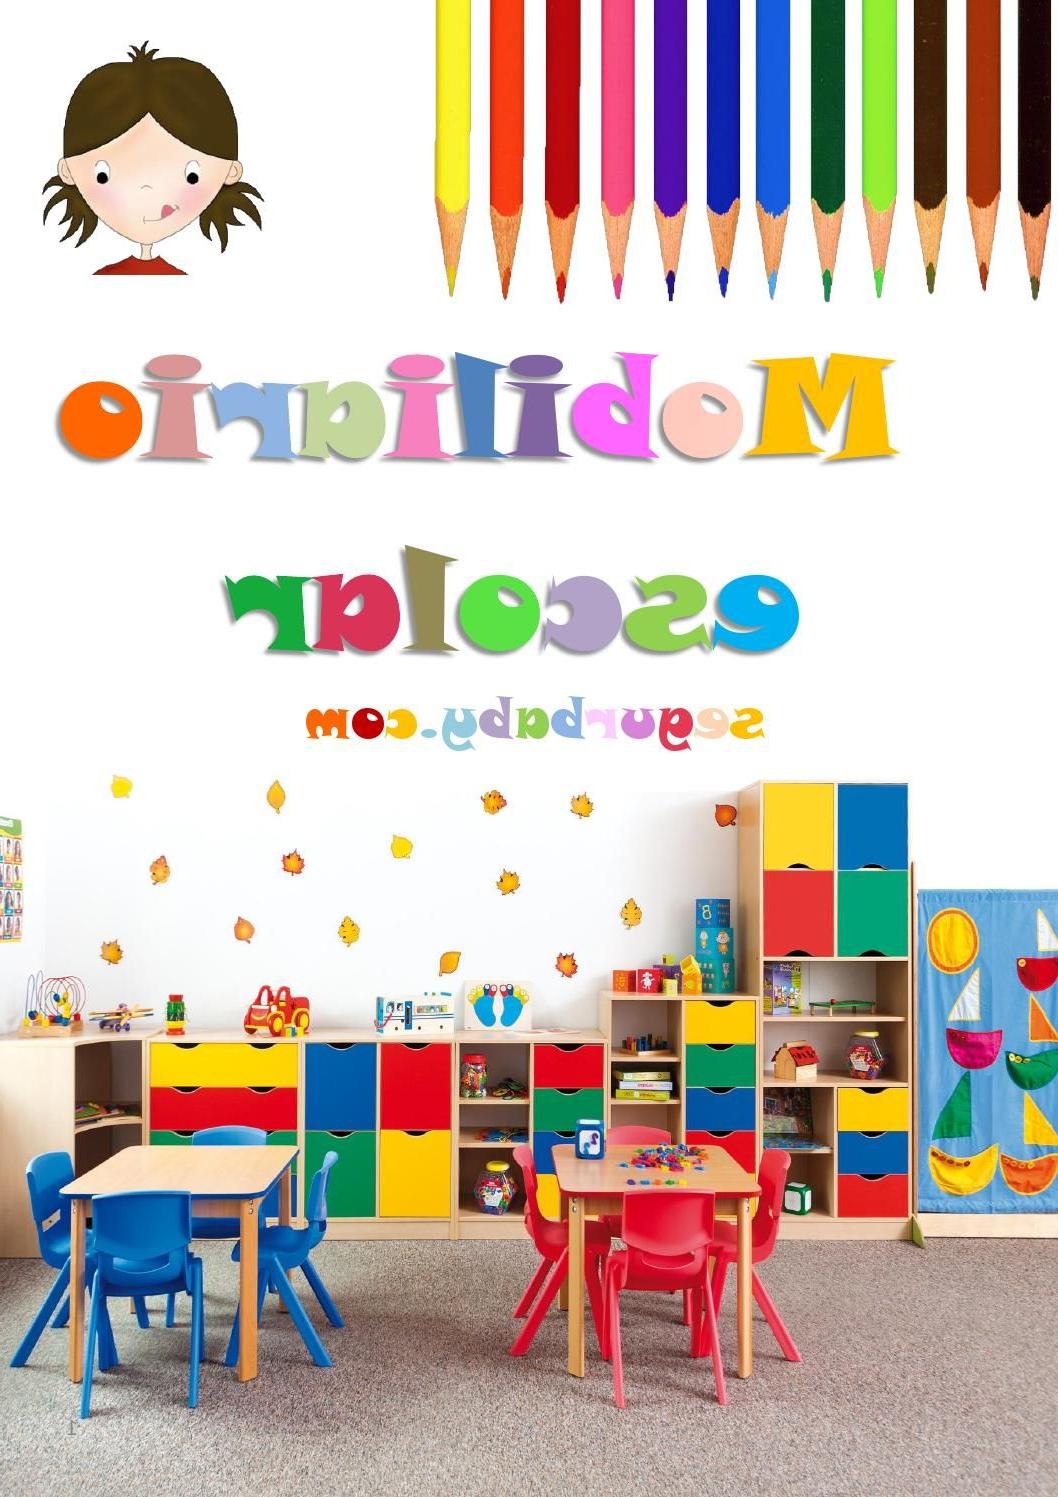 Mobiliario Escolar Infantil Tqd3 Catà Logo De Mobiliario Escolar En 2018 Biblioteca Mobiliario